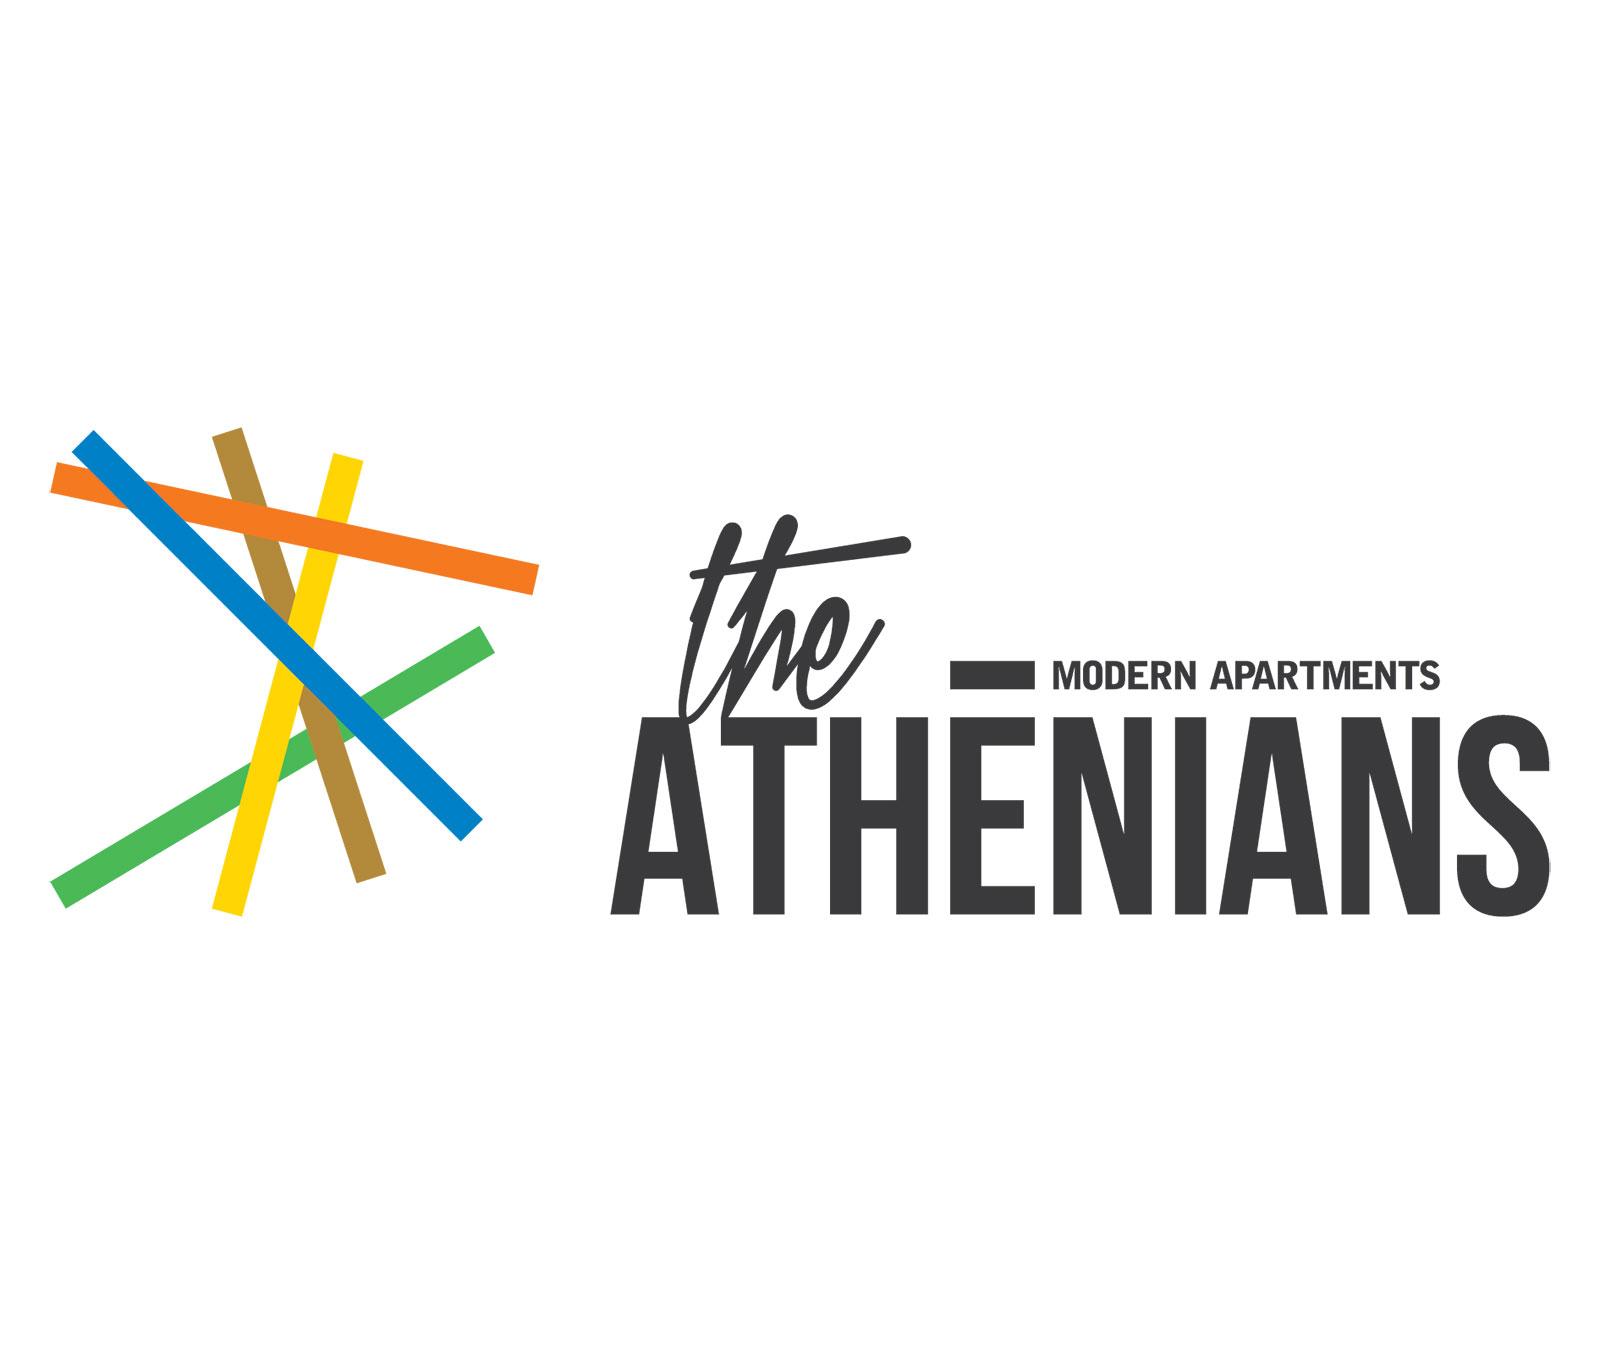 THE_ATHENIANS_LOGO